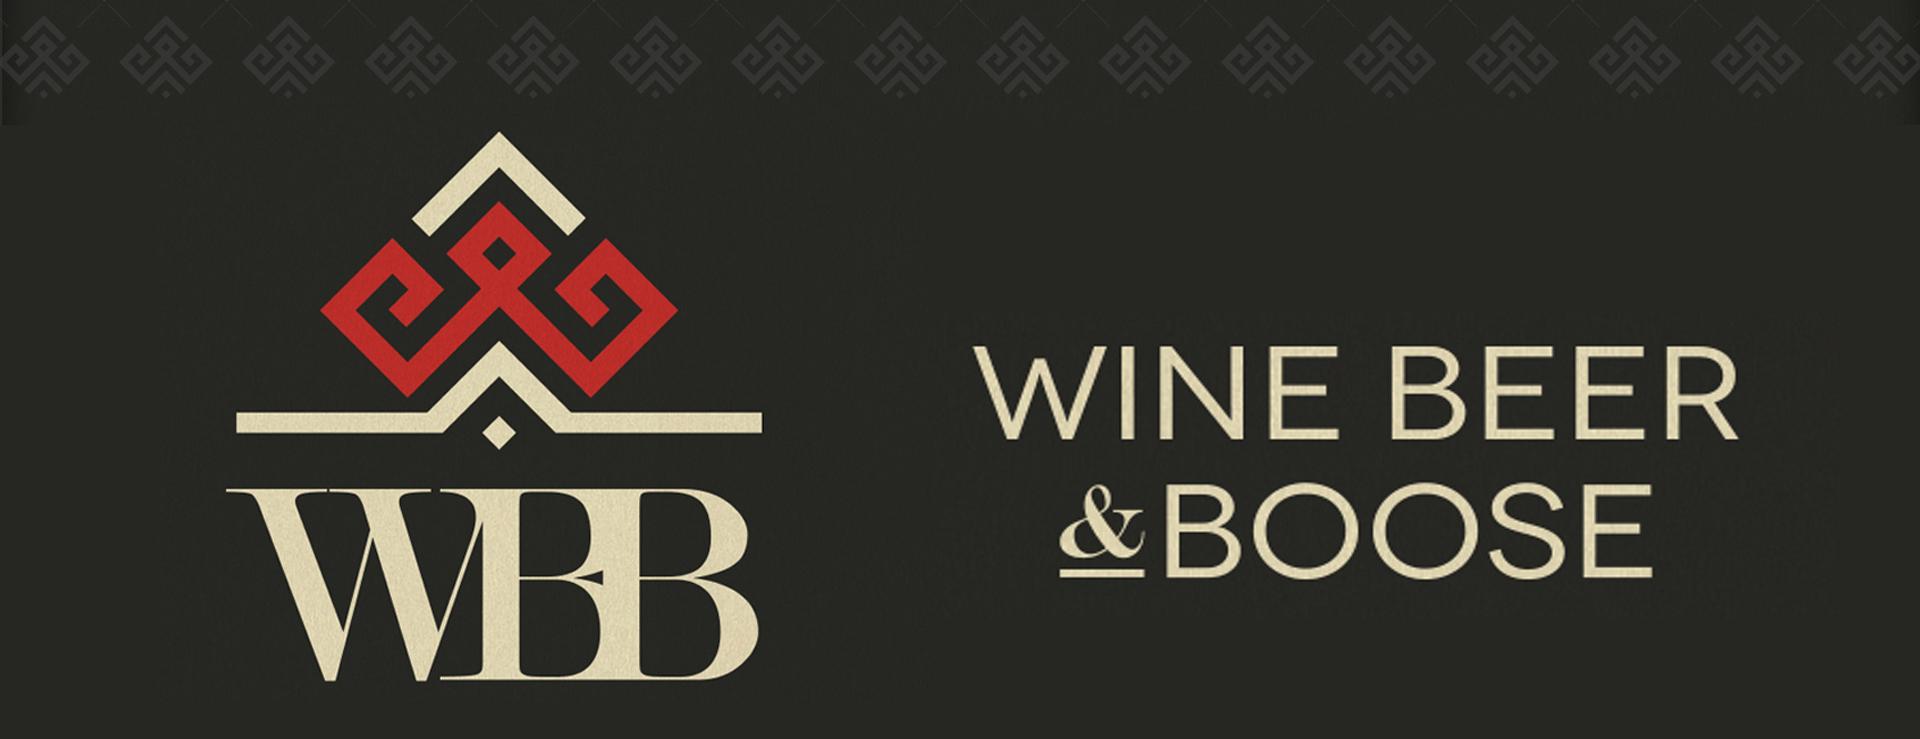 WBB WINE